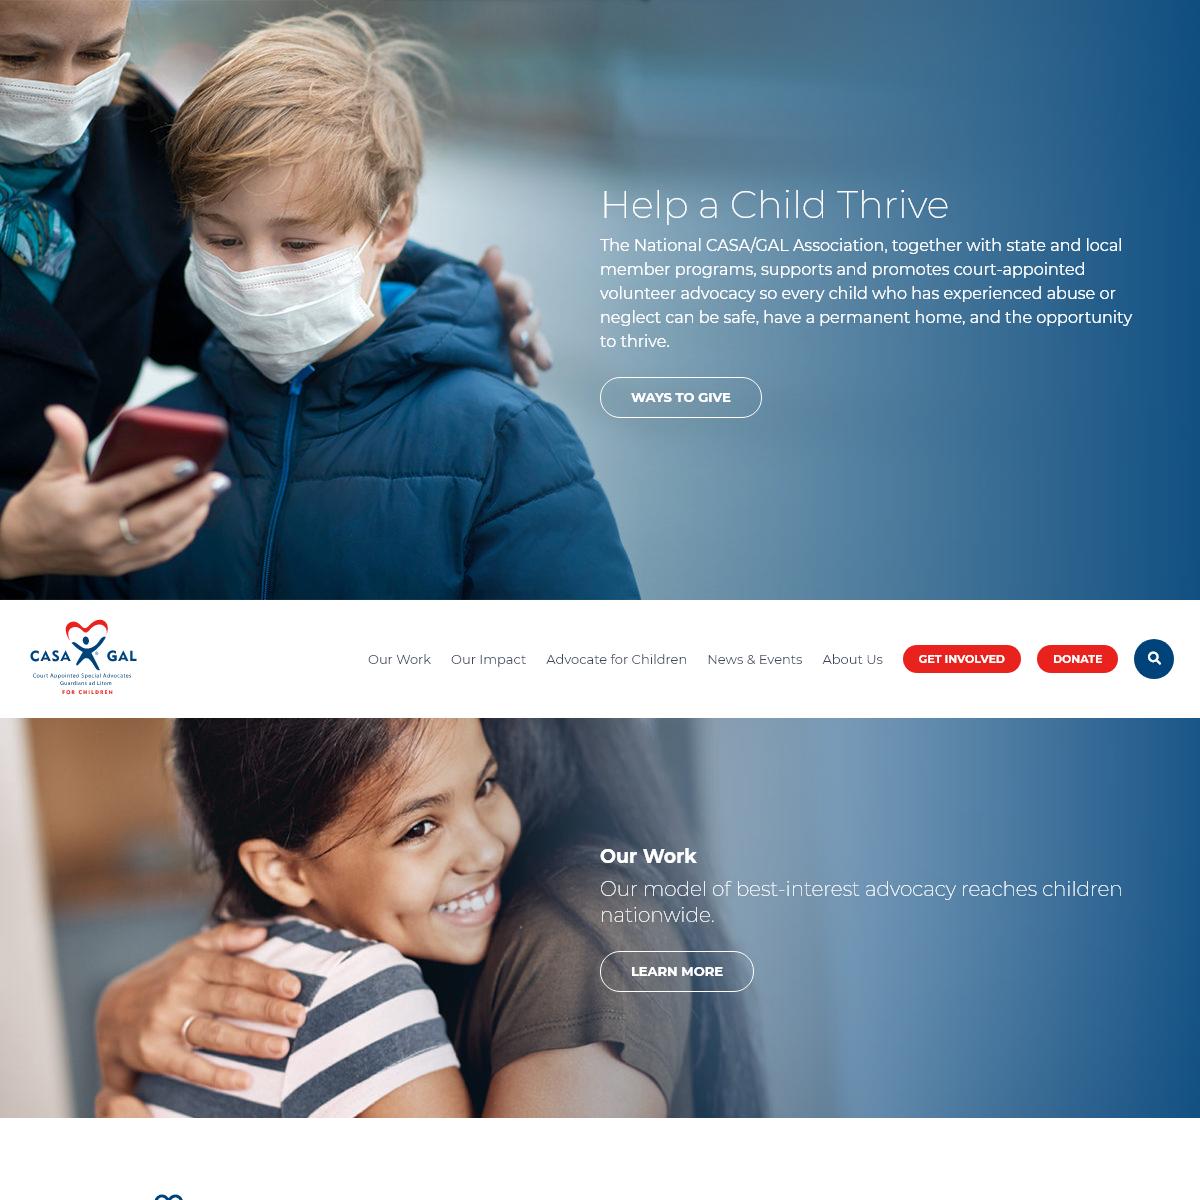 Home - National CASA-GAL Association for Children